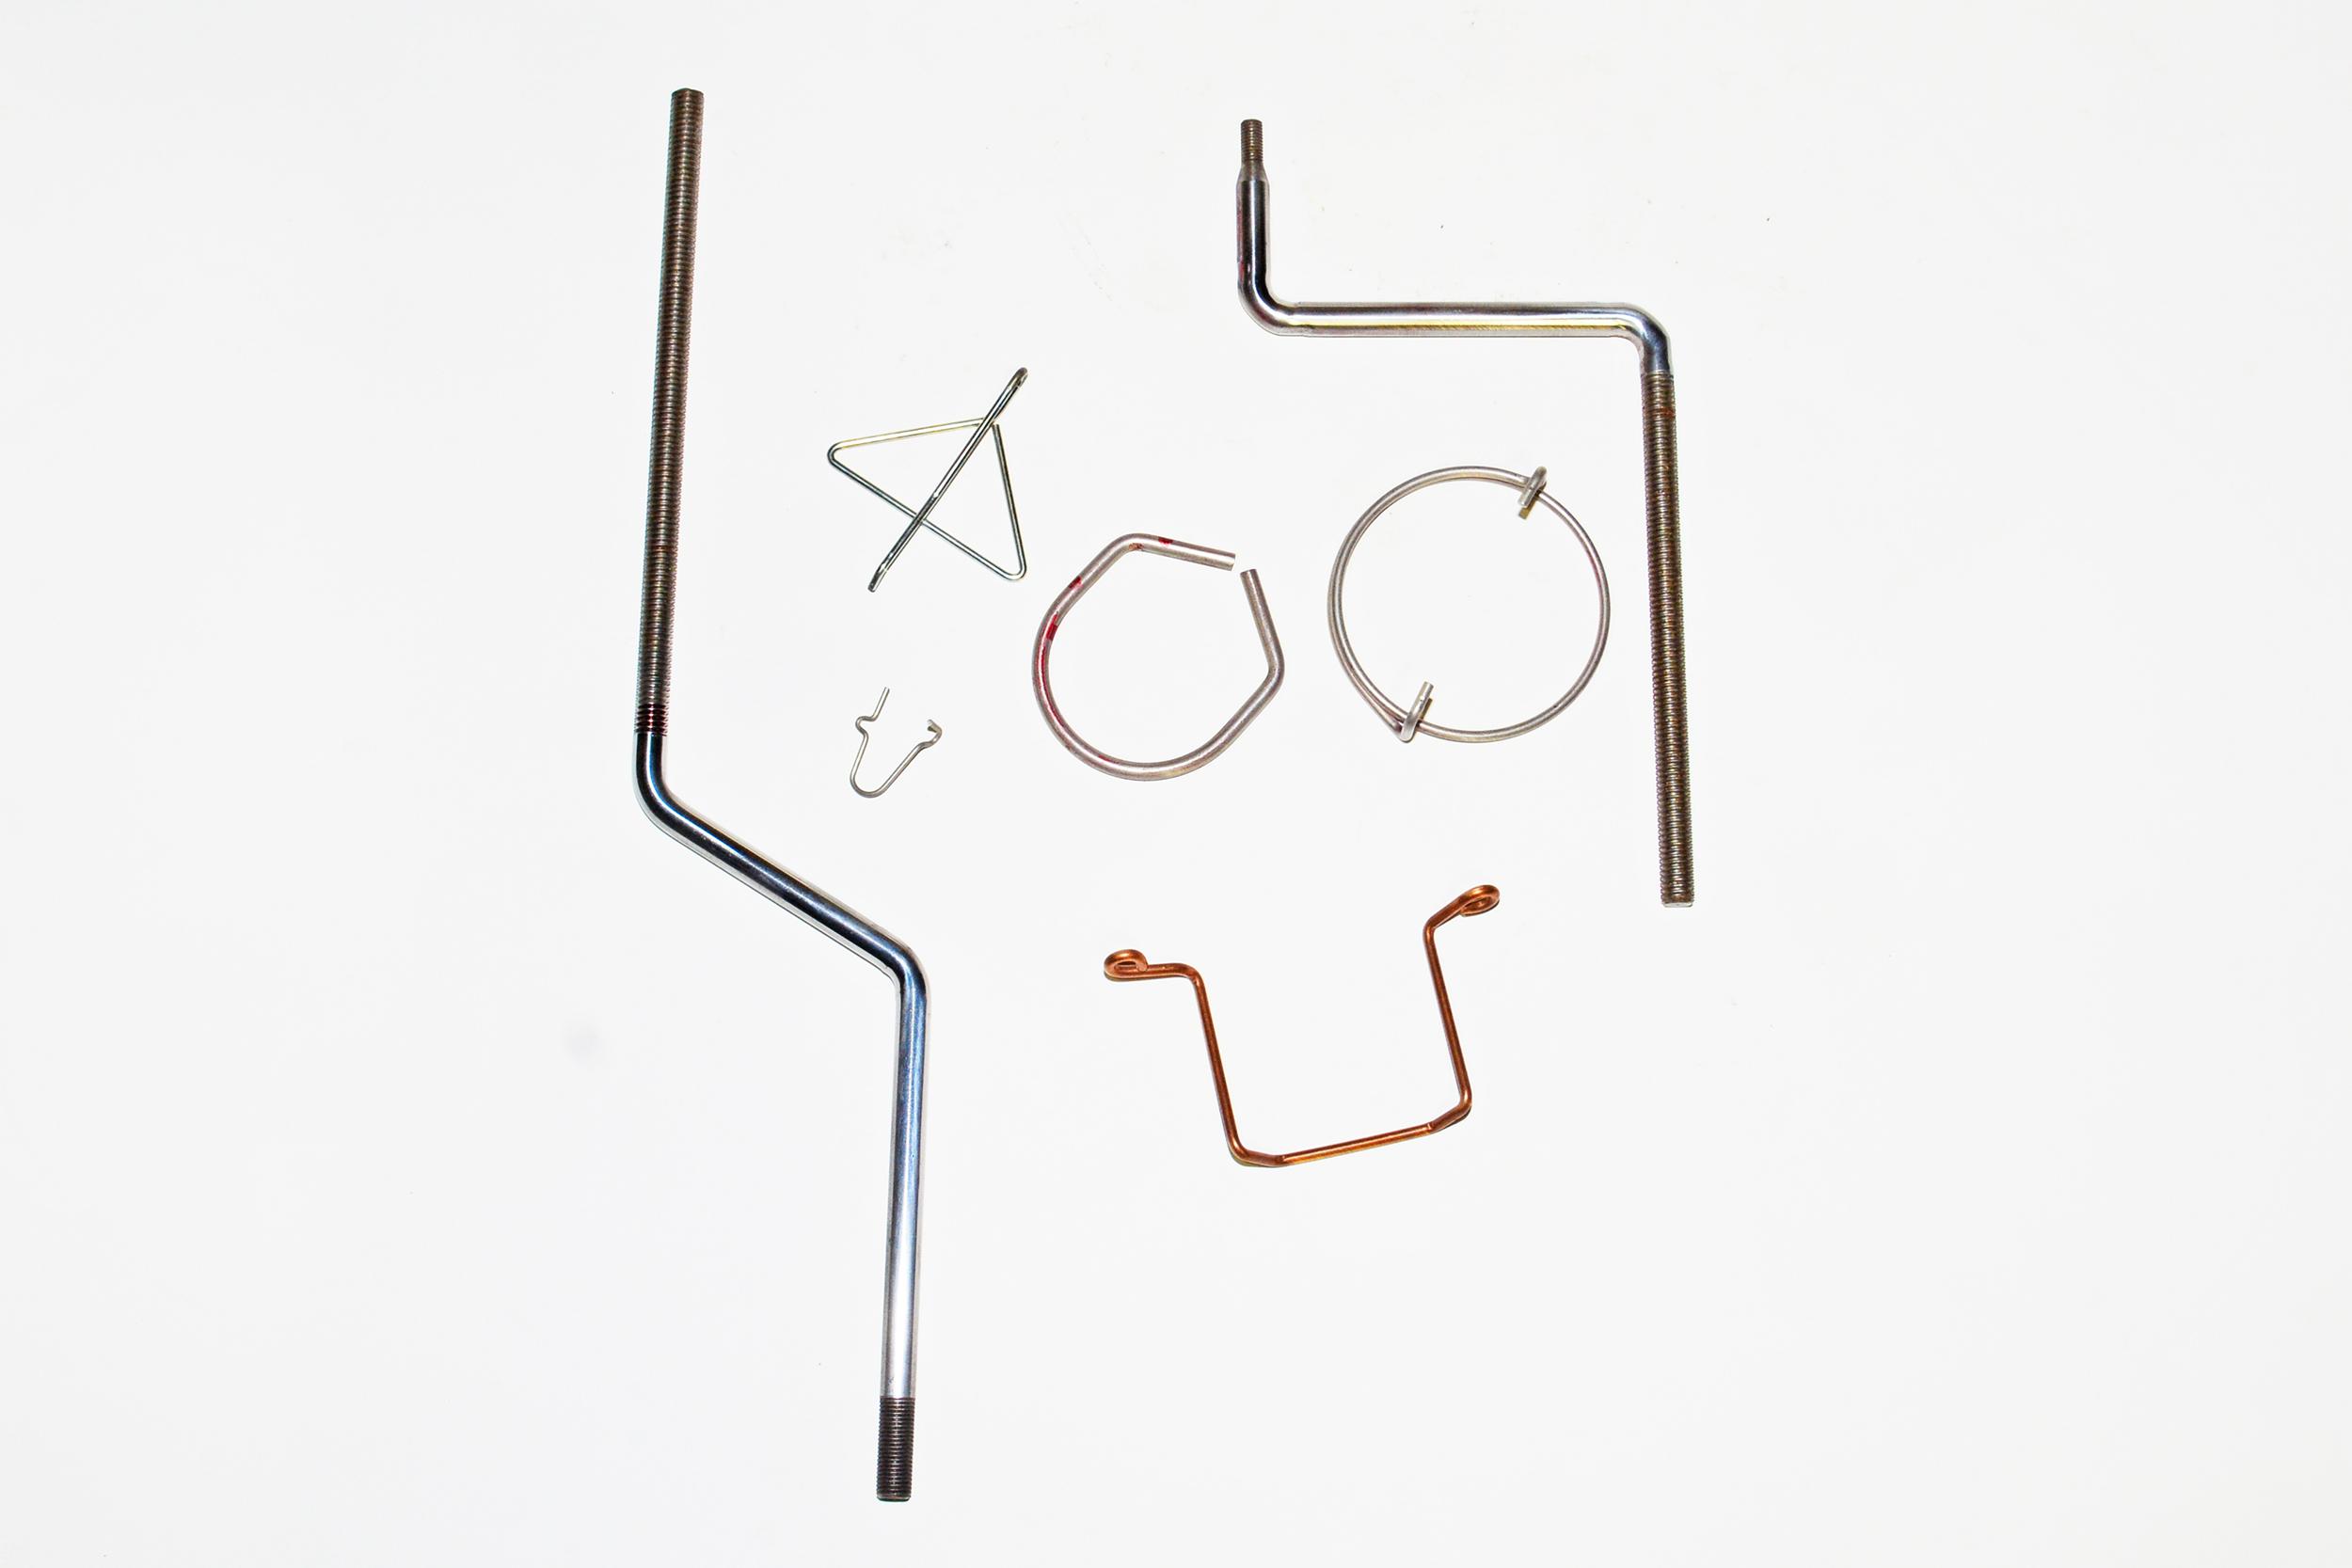 wireform2-lewel-tool.JPG